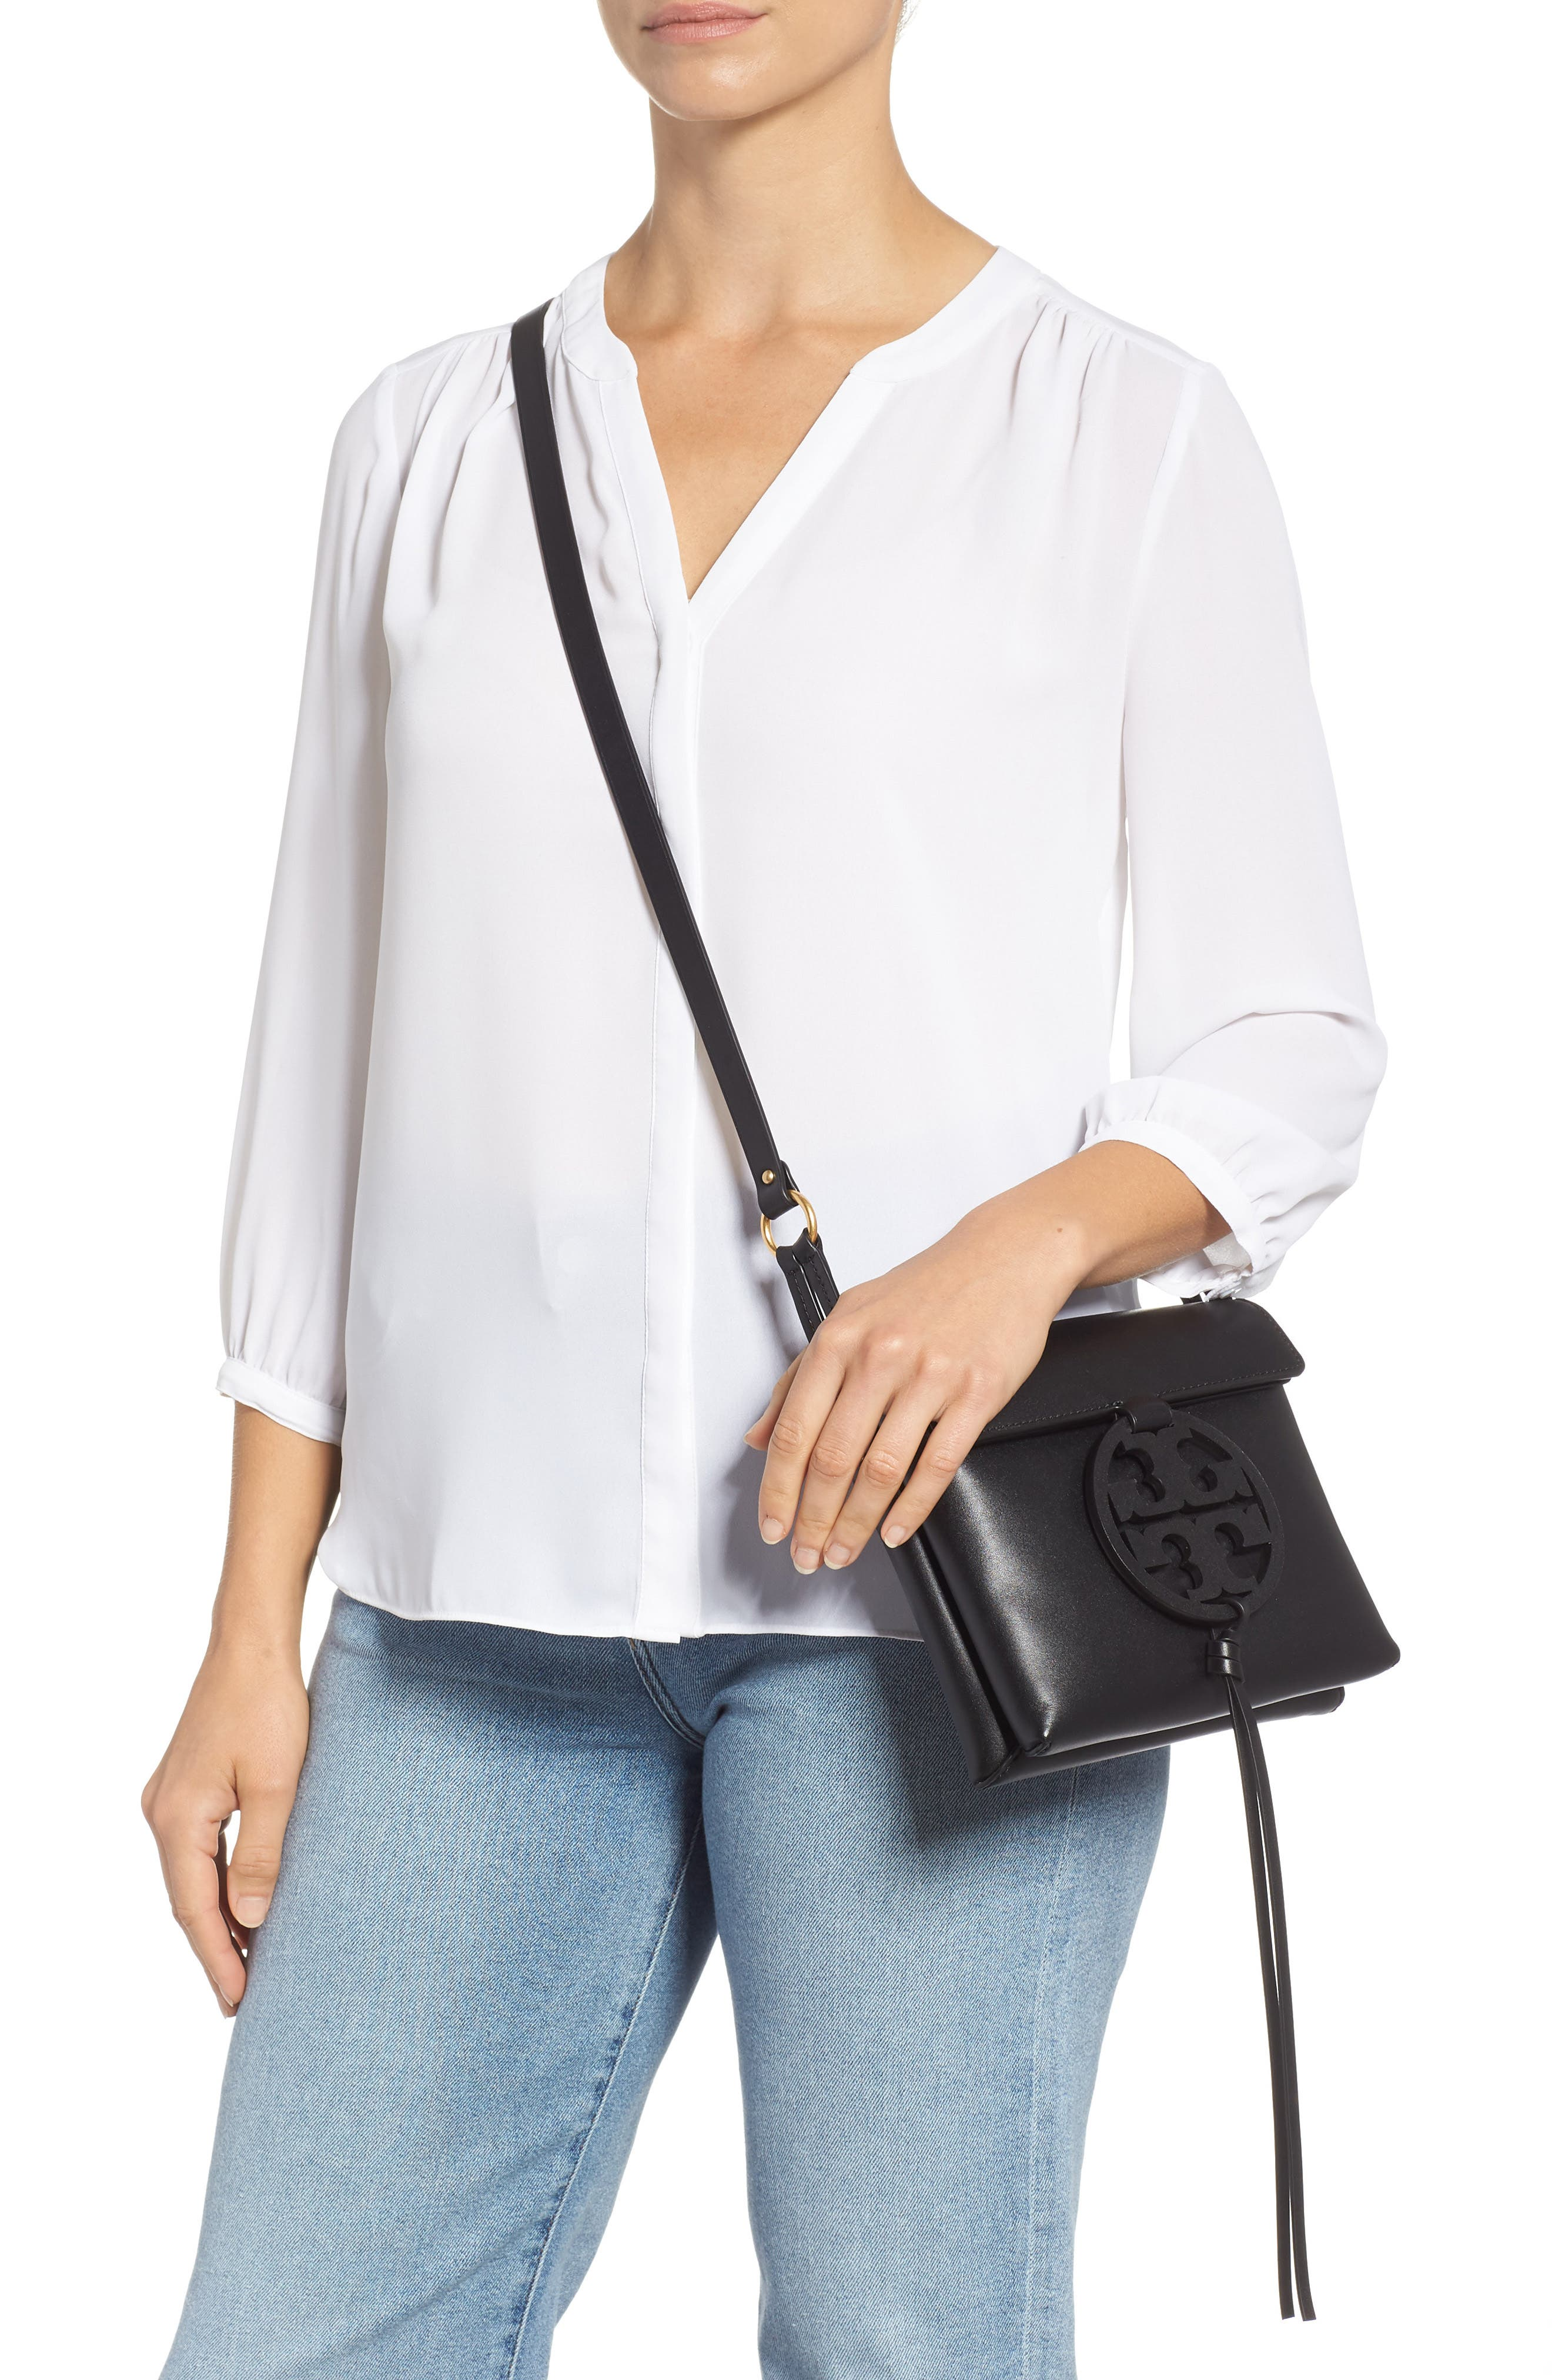 Miller Leather Crossbody Bag,                             Alternate thumbnail 2, color,                             BLACK